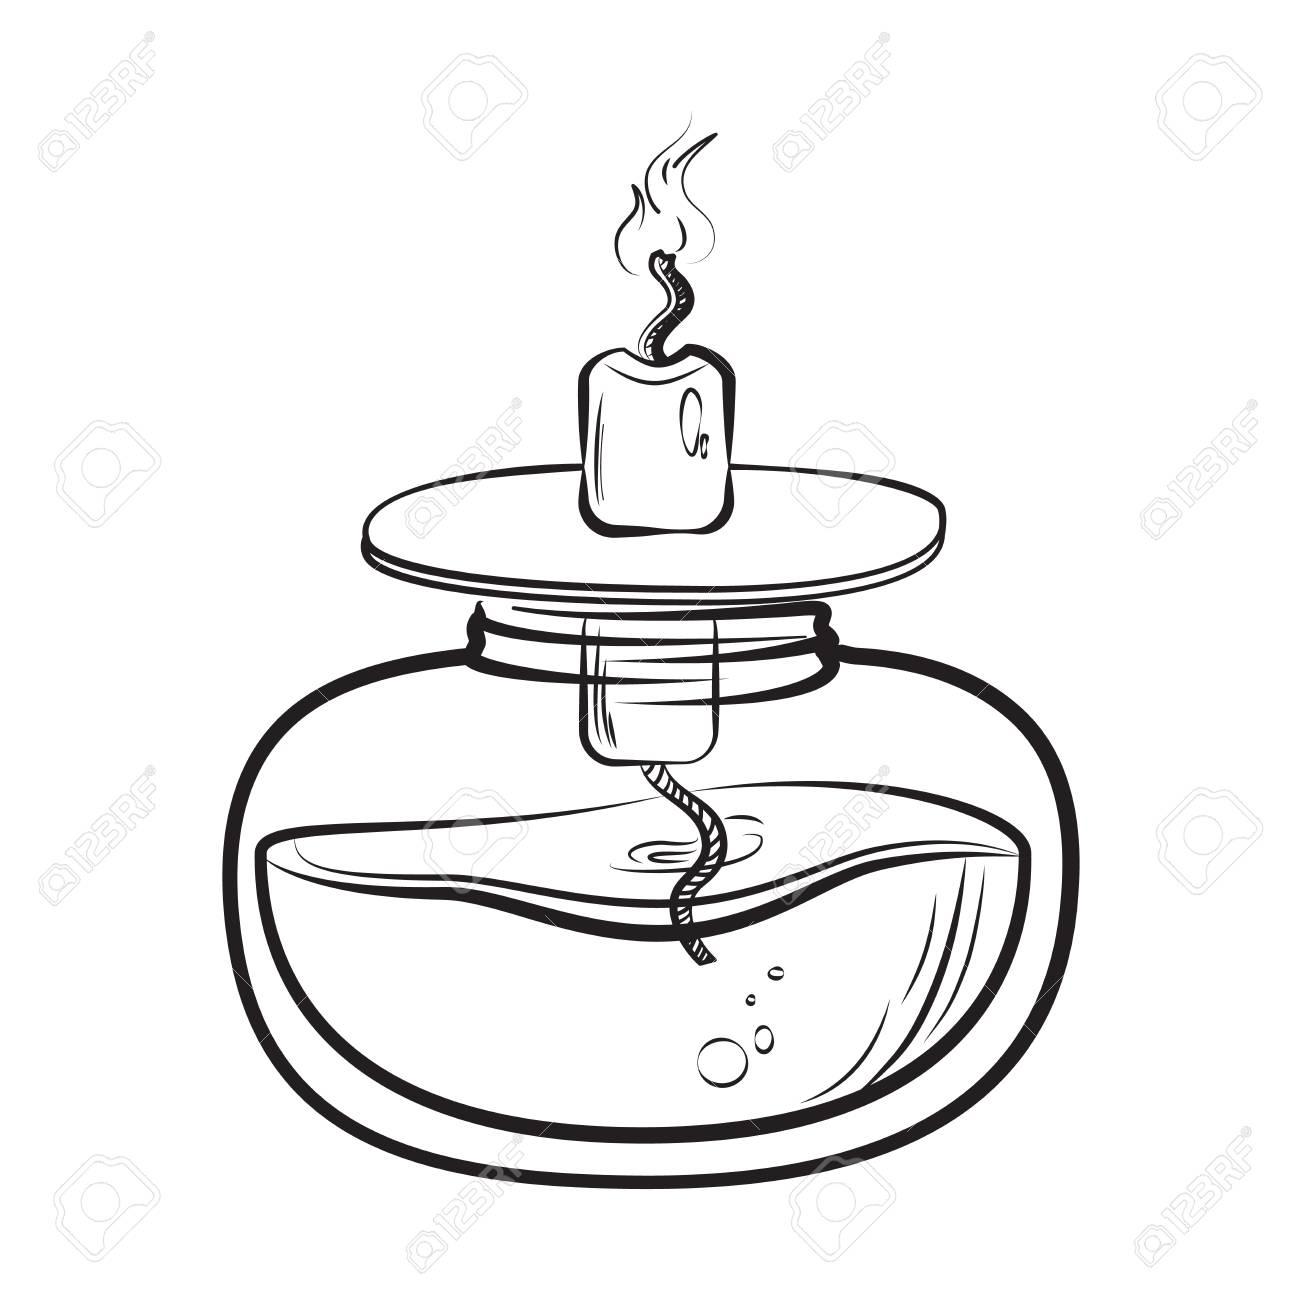 1300x1300 Sketch Of Spirit Lamp Chemical Burner Royalty Free Cliparts